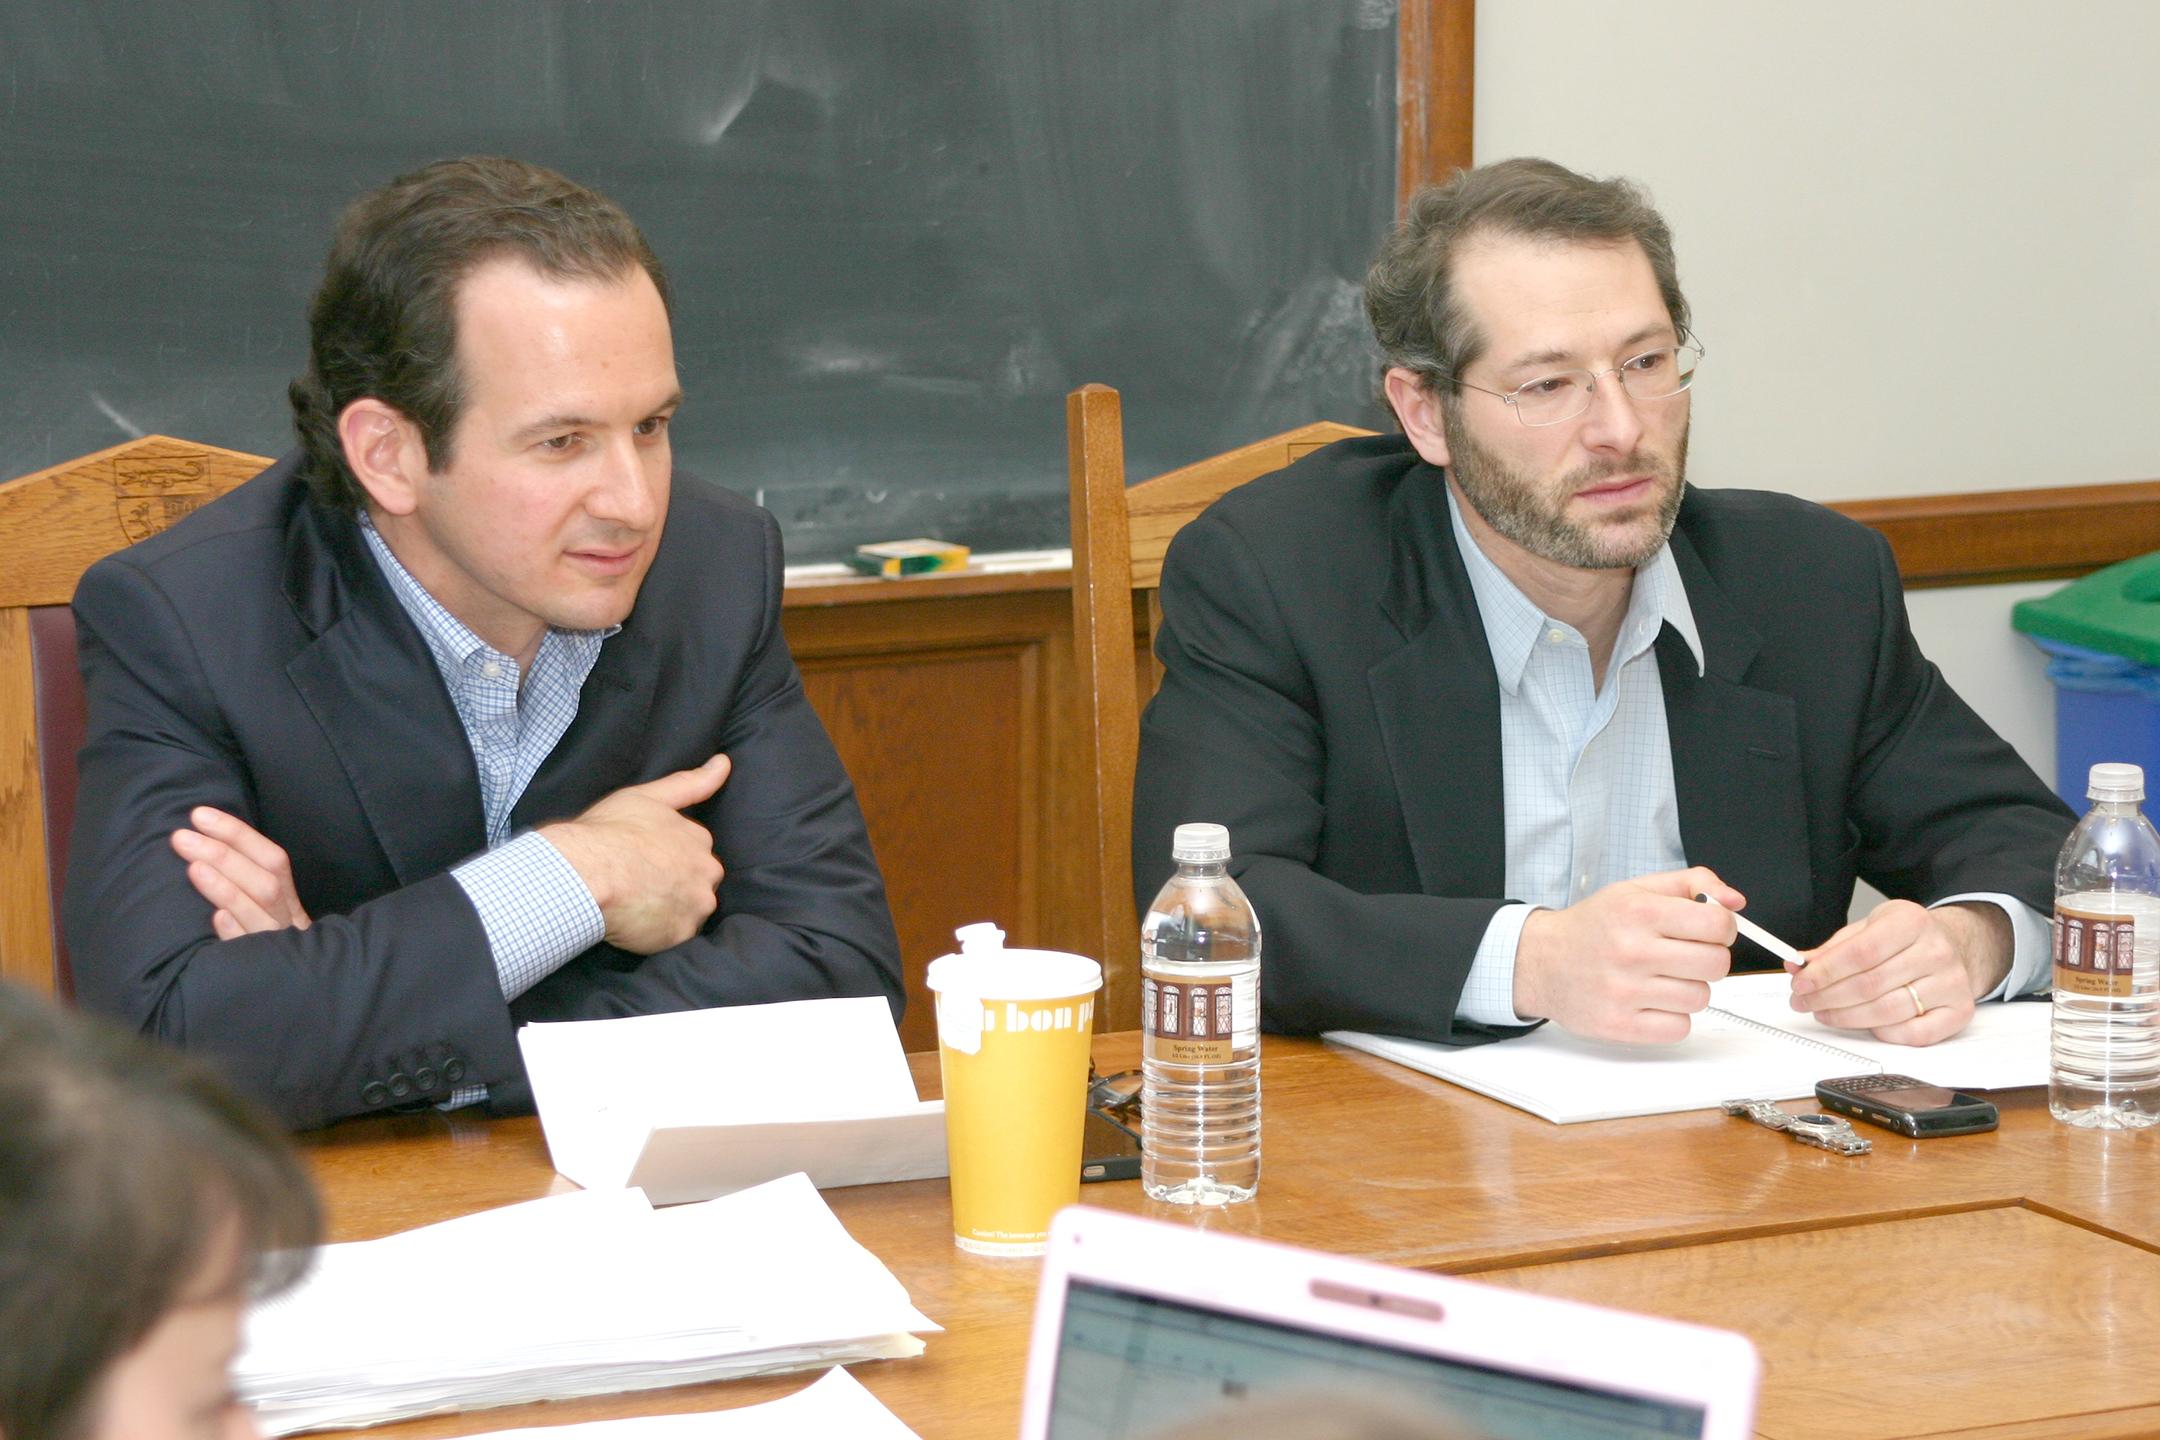 Josh L. Abramowitz '97 and Brett F. Cohen '97